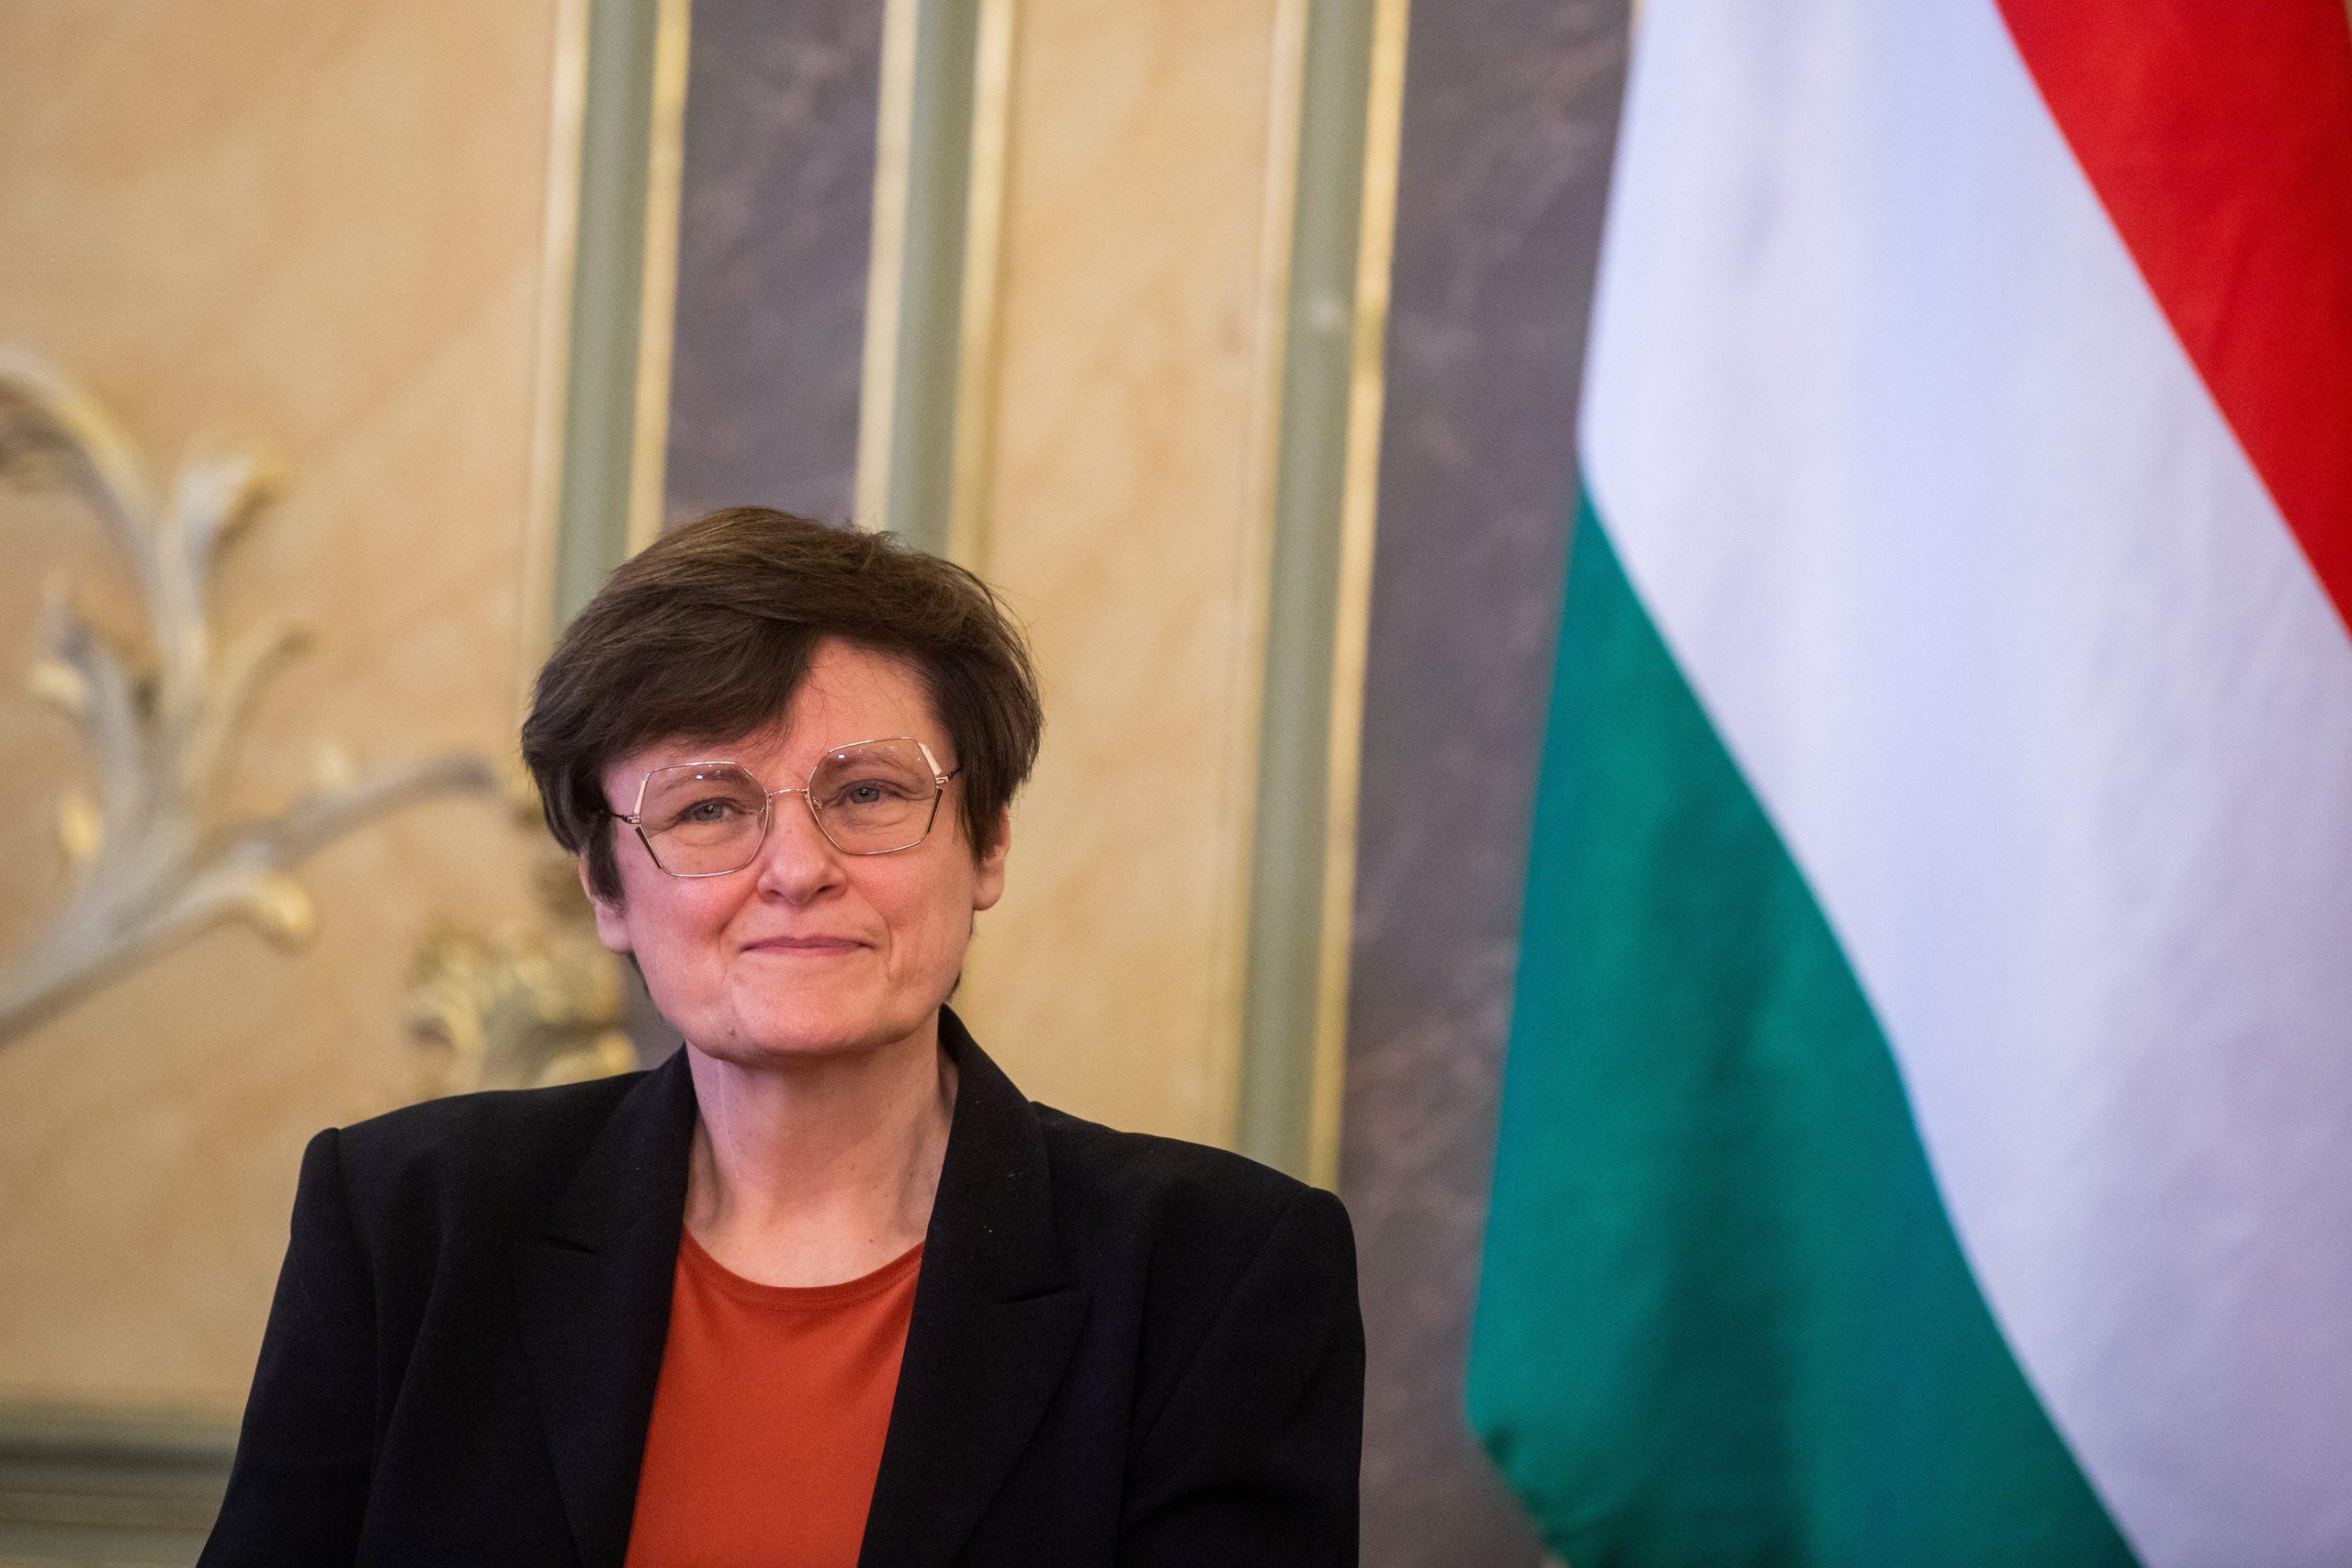 Medizin-Nobelpreis geht überraschend nicht an Katalin Karikó